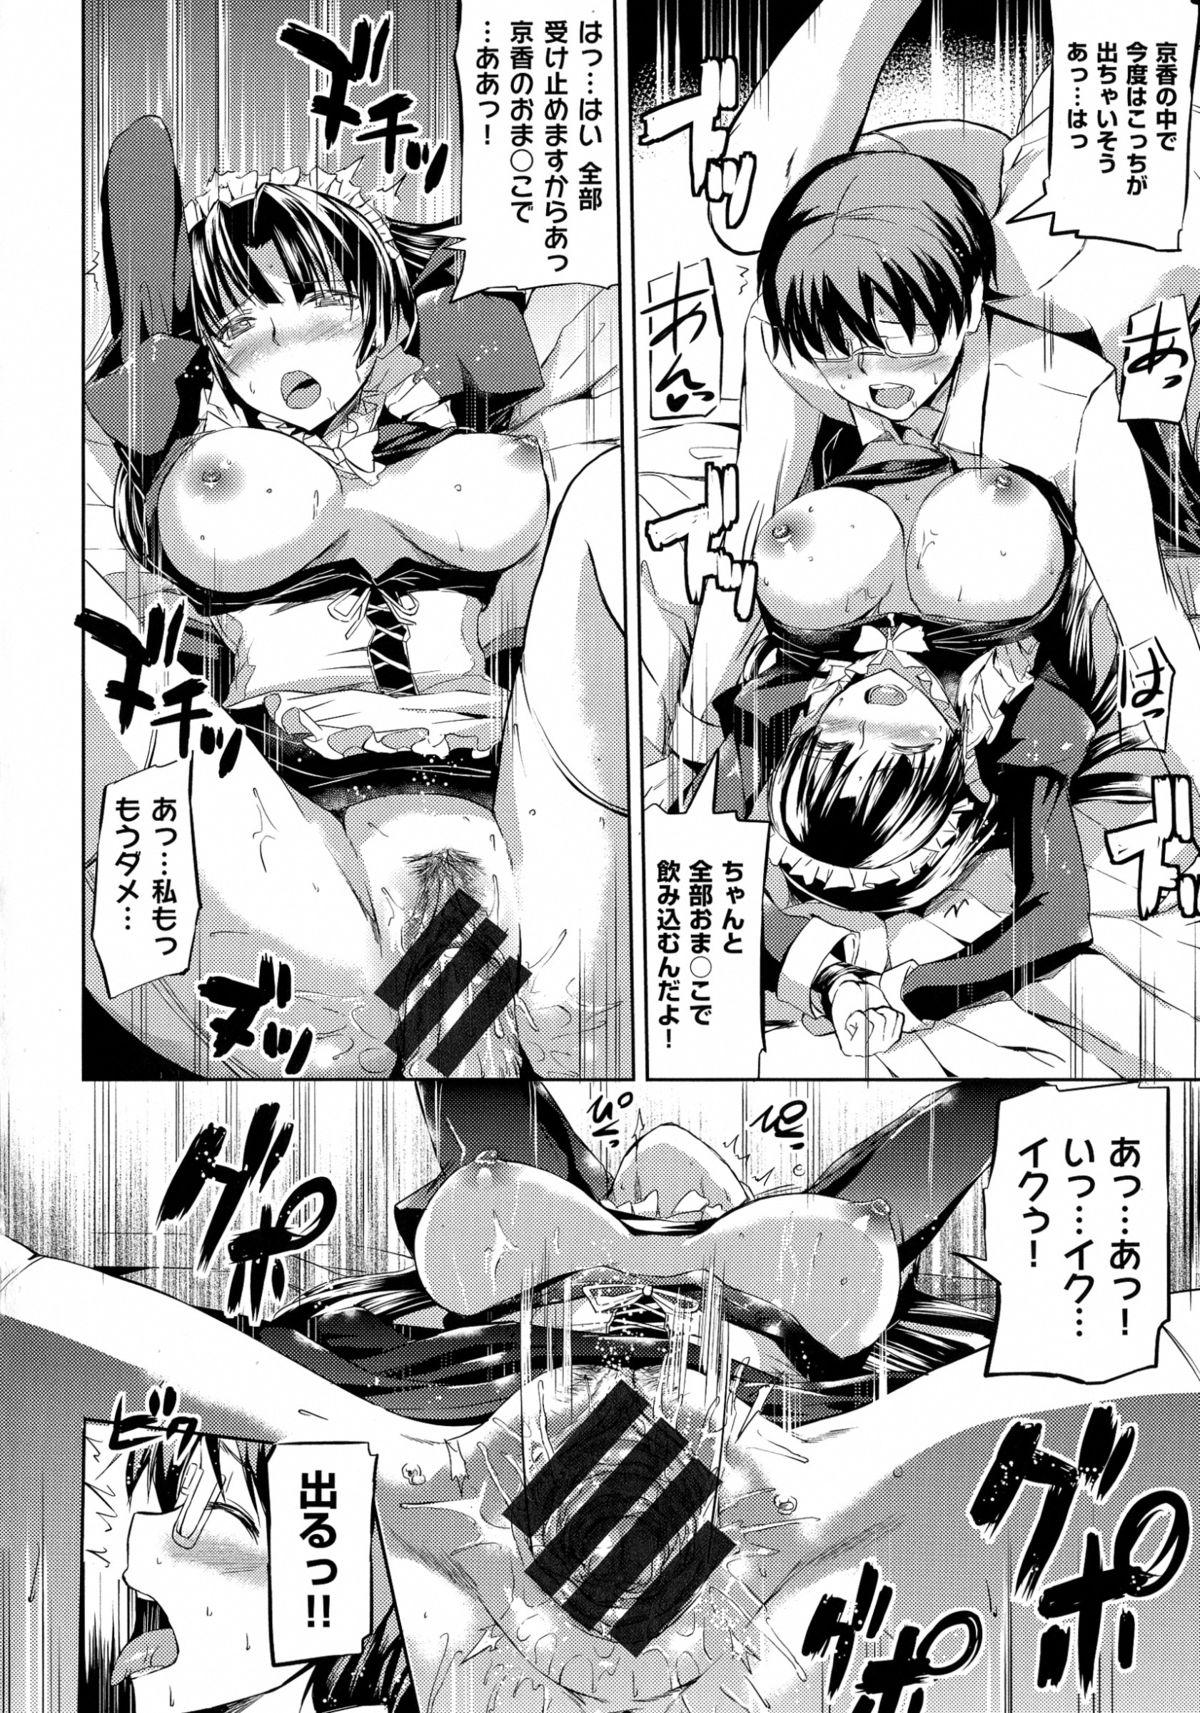 Ojousama no Maid Jijou 123